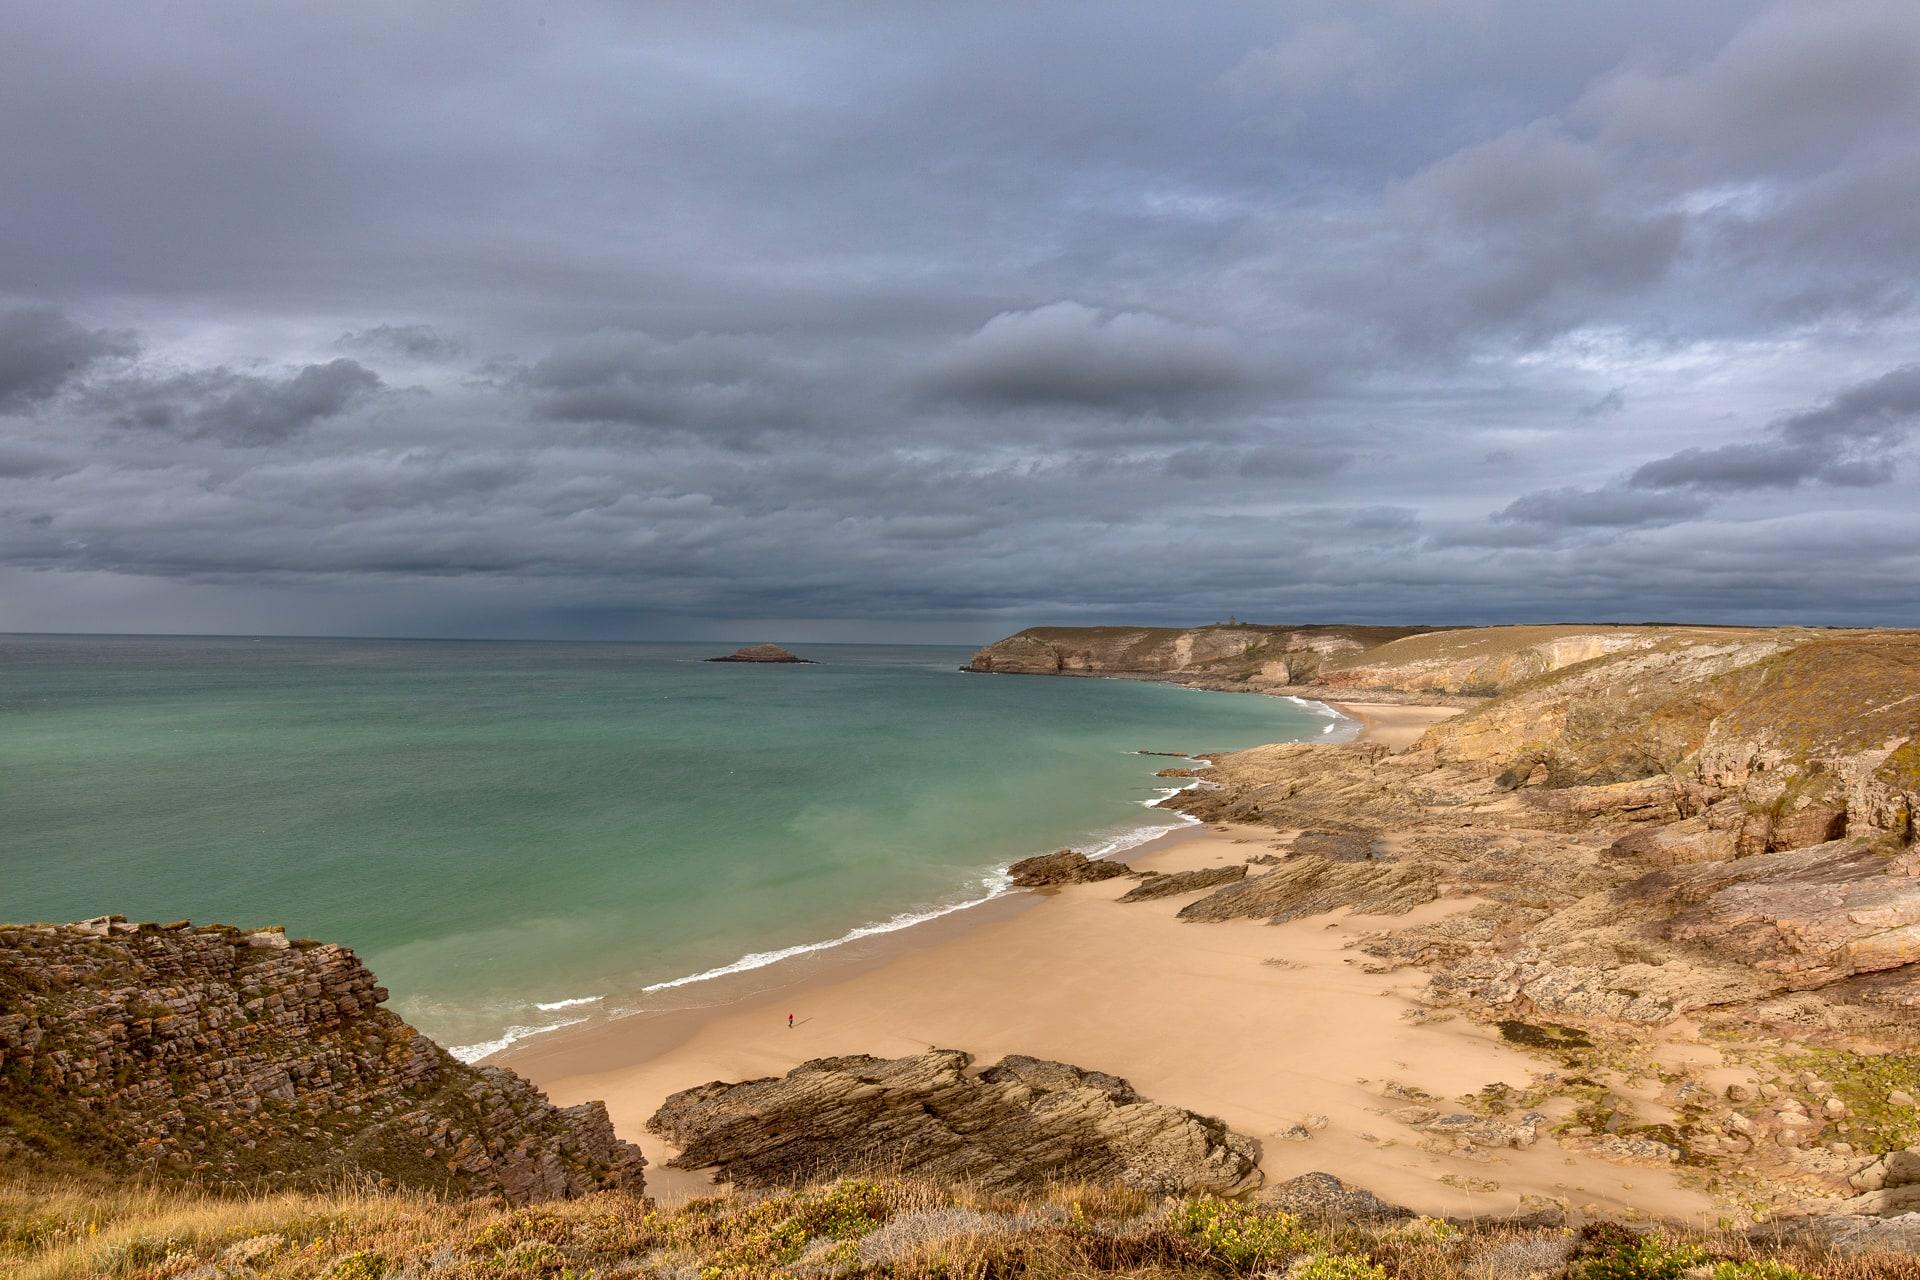 Panorama de la côte sauvage